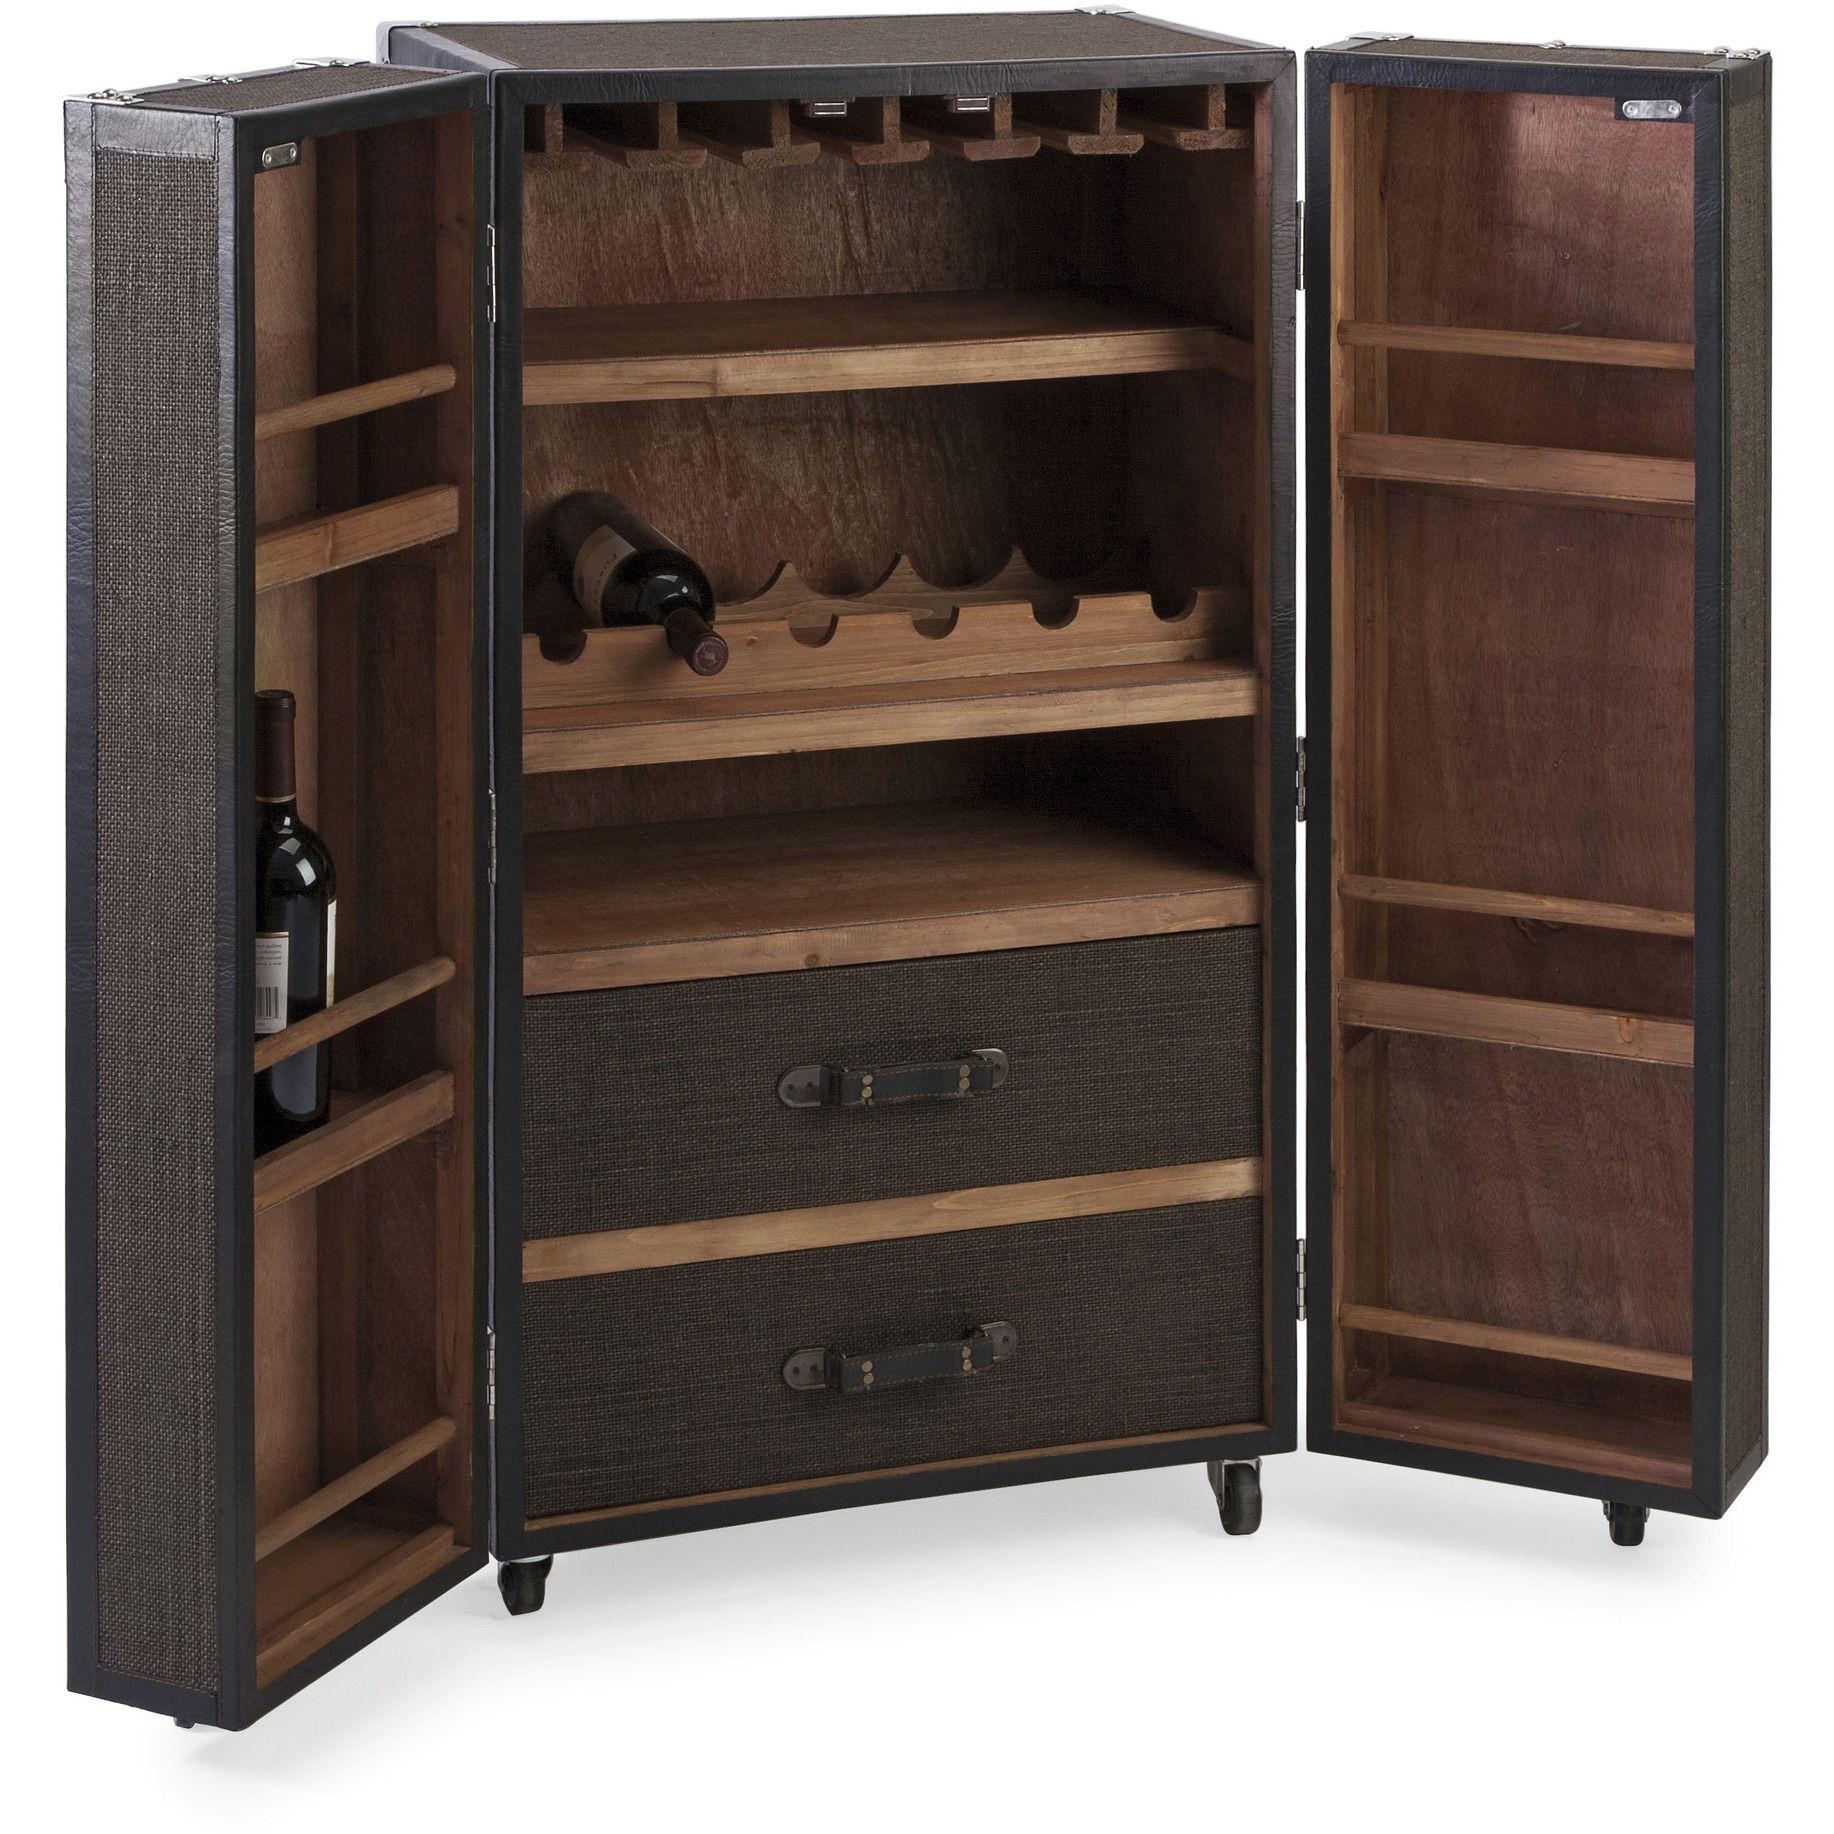 Pinot Rolling Wine Trunk Wine Bar Cabinet Wine Cabinets Furniture